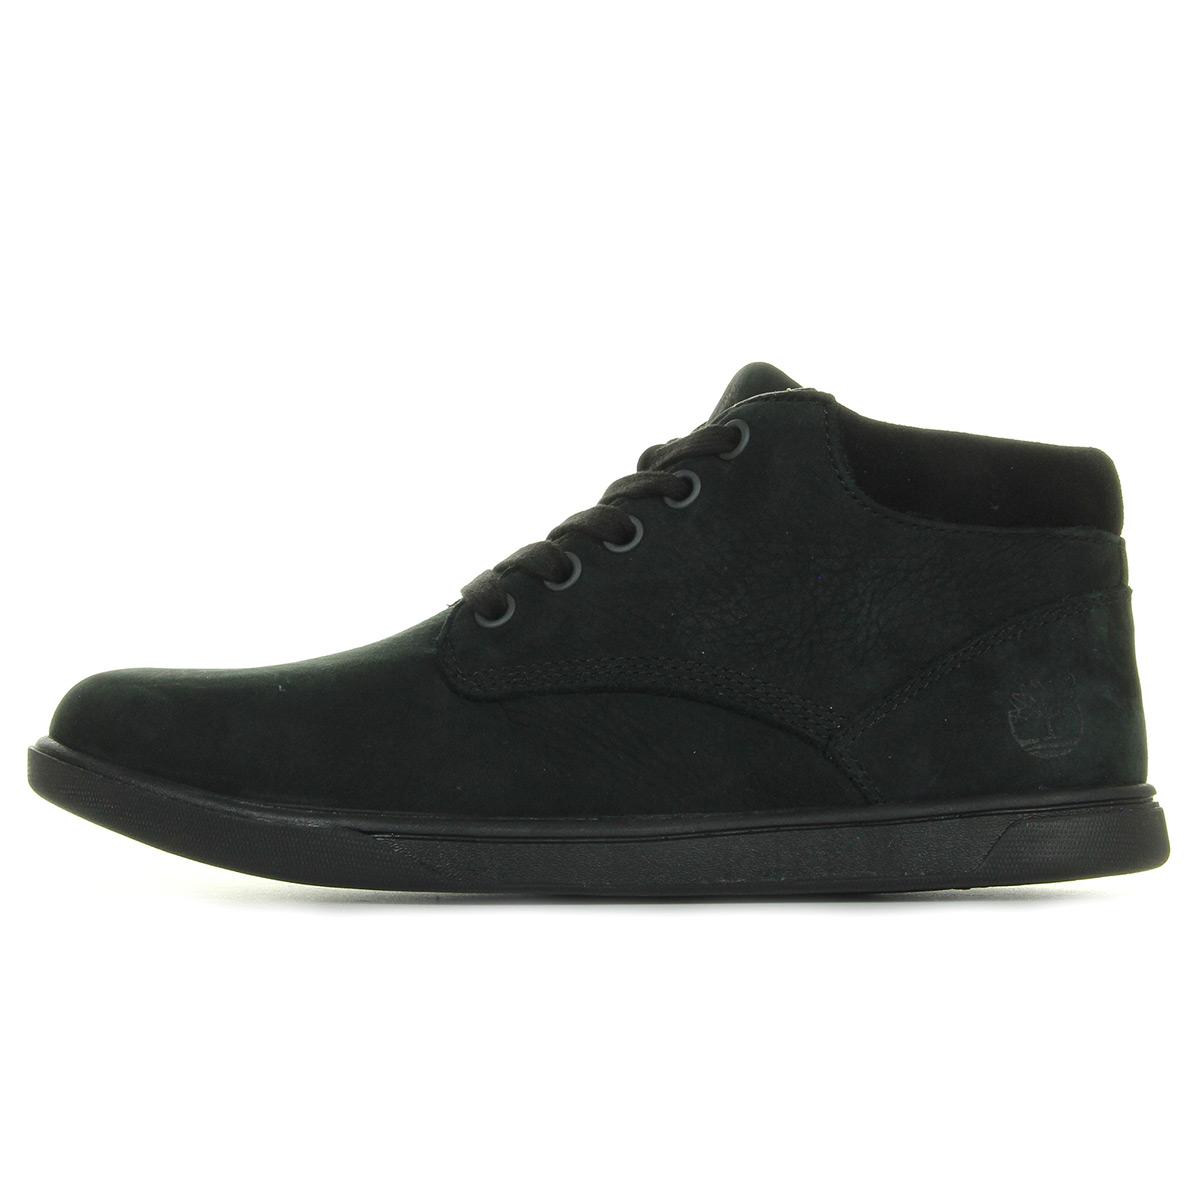 Bottes Timberland Groveton Leather Chukka Black l08VJ5Y